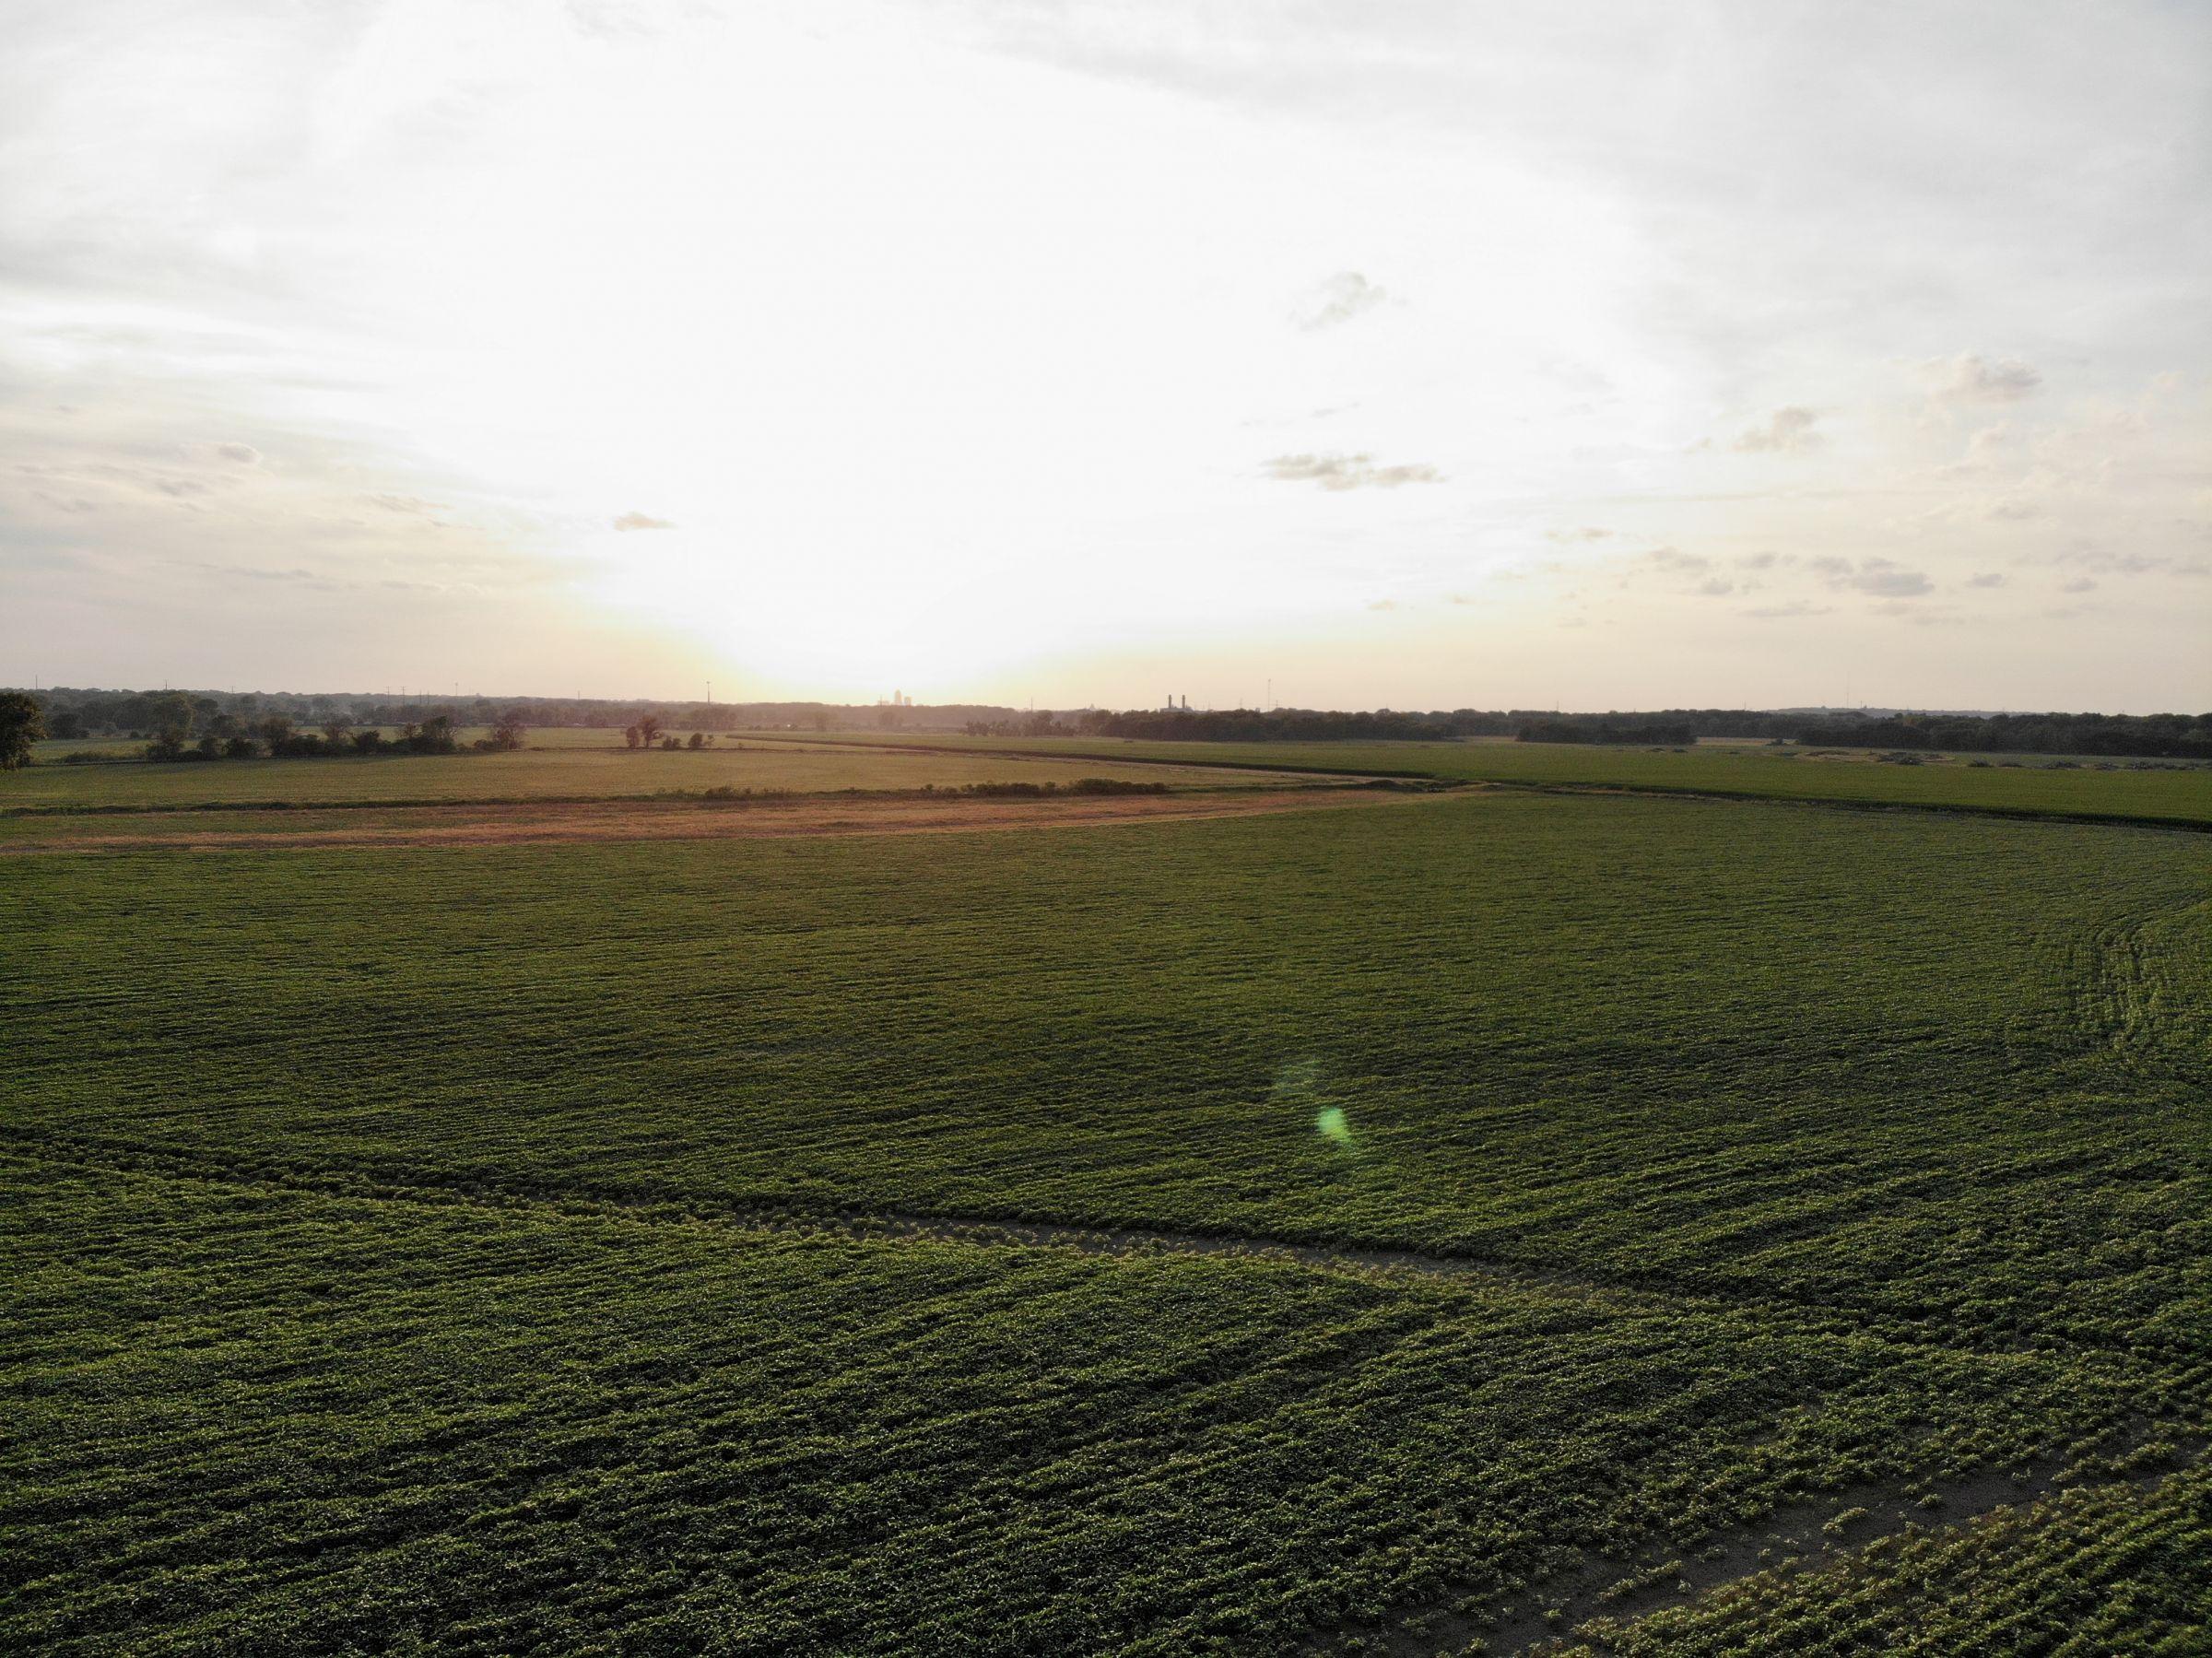 land-polk-county-iowa-242-acres-listing-number-15627-4-2021-07-09-145456.jpg